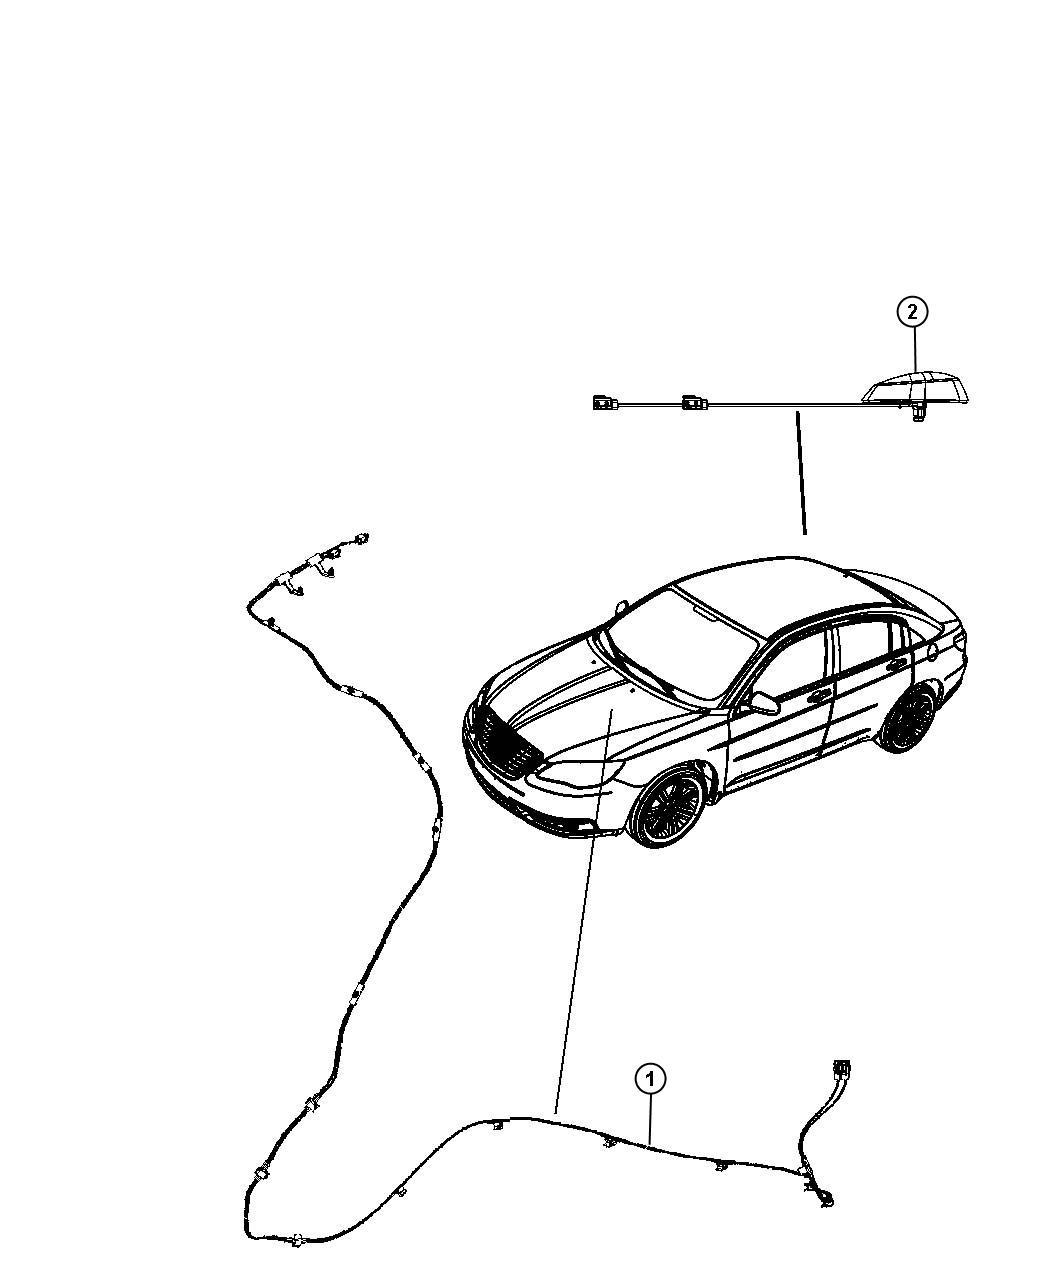 Chrysler 200 Cable, wiring. Radio, satellite radio